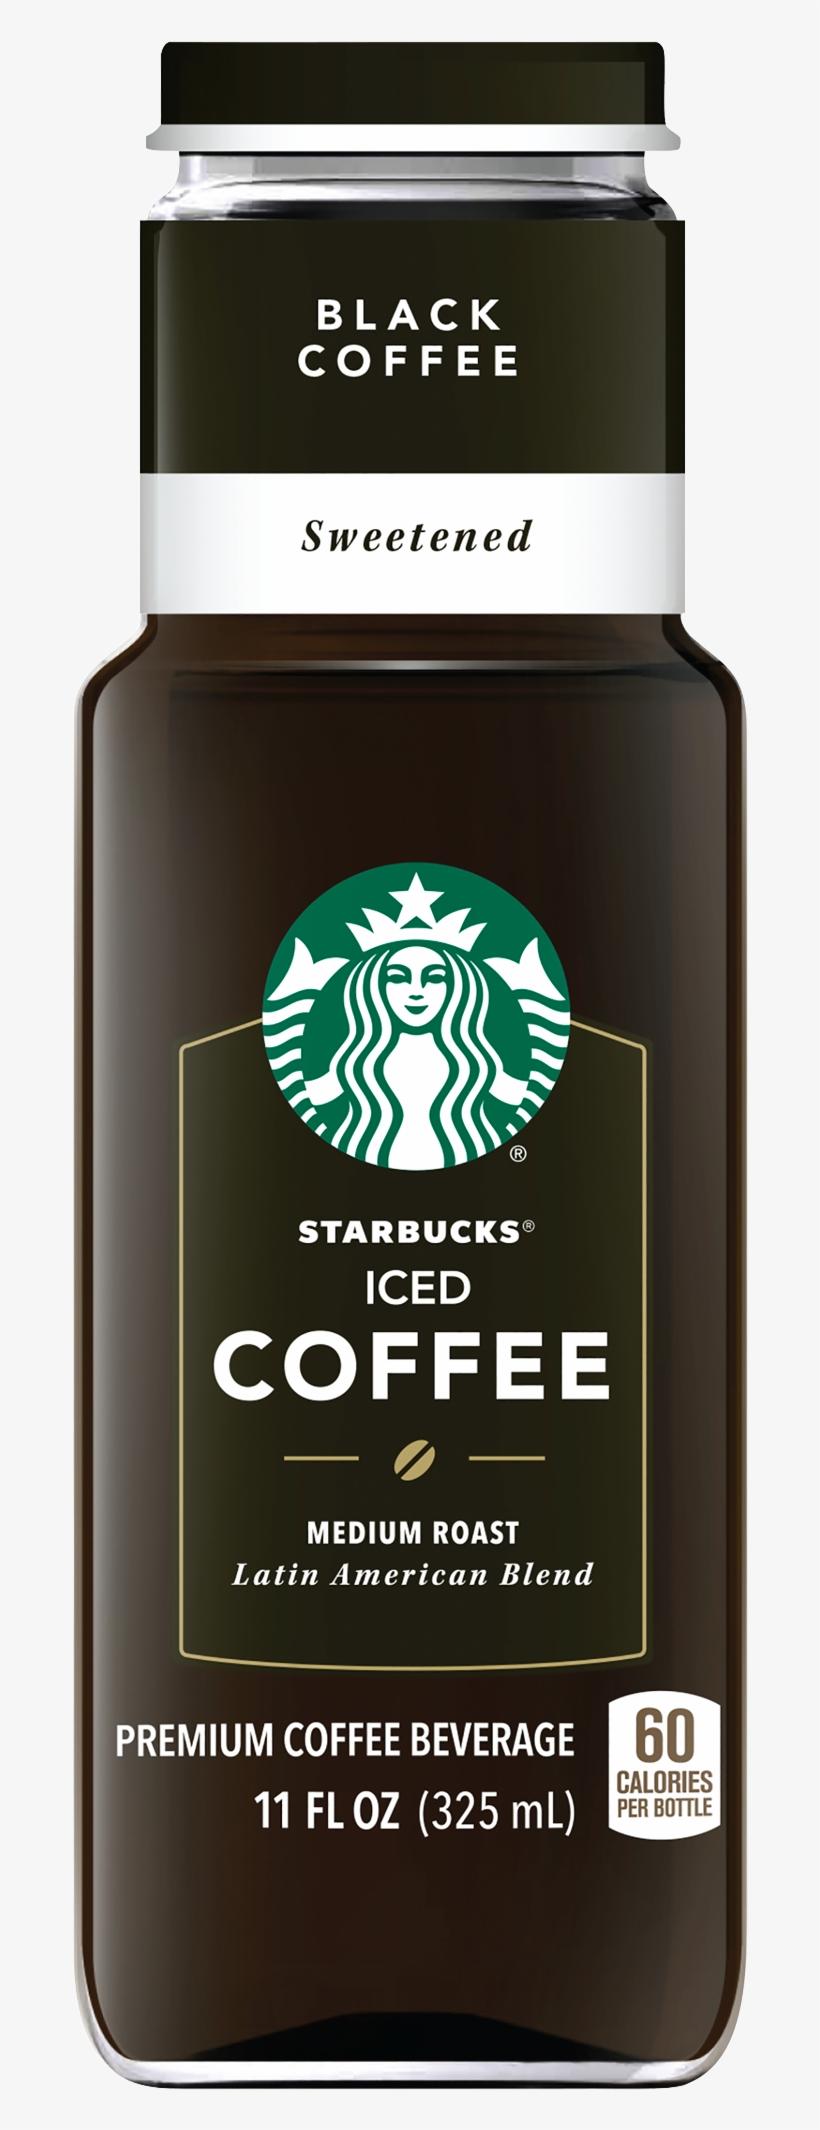 Starbucks Iced Coffee Black Sweetened - Starbucks Black Iced Coffee, transparent png #2018542